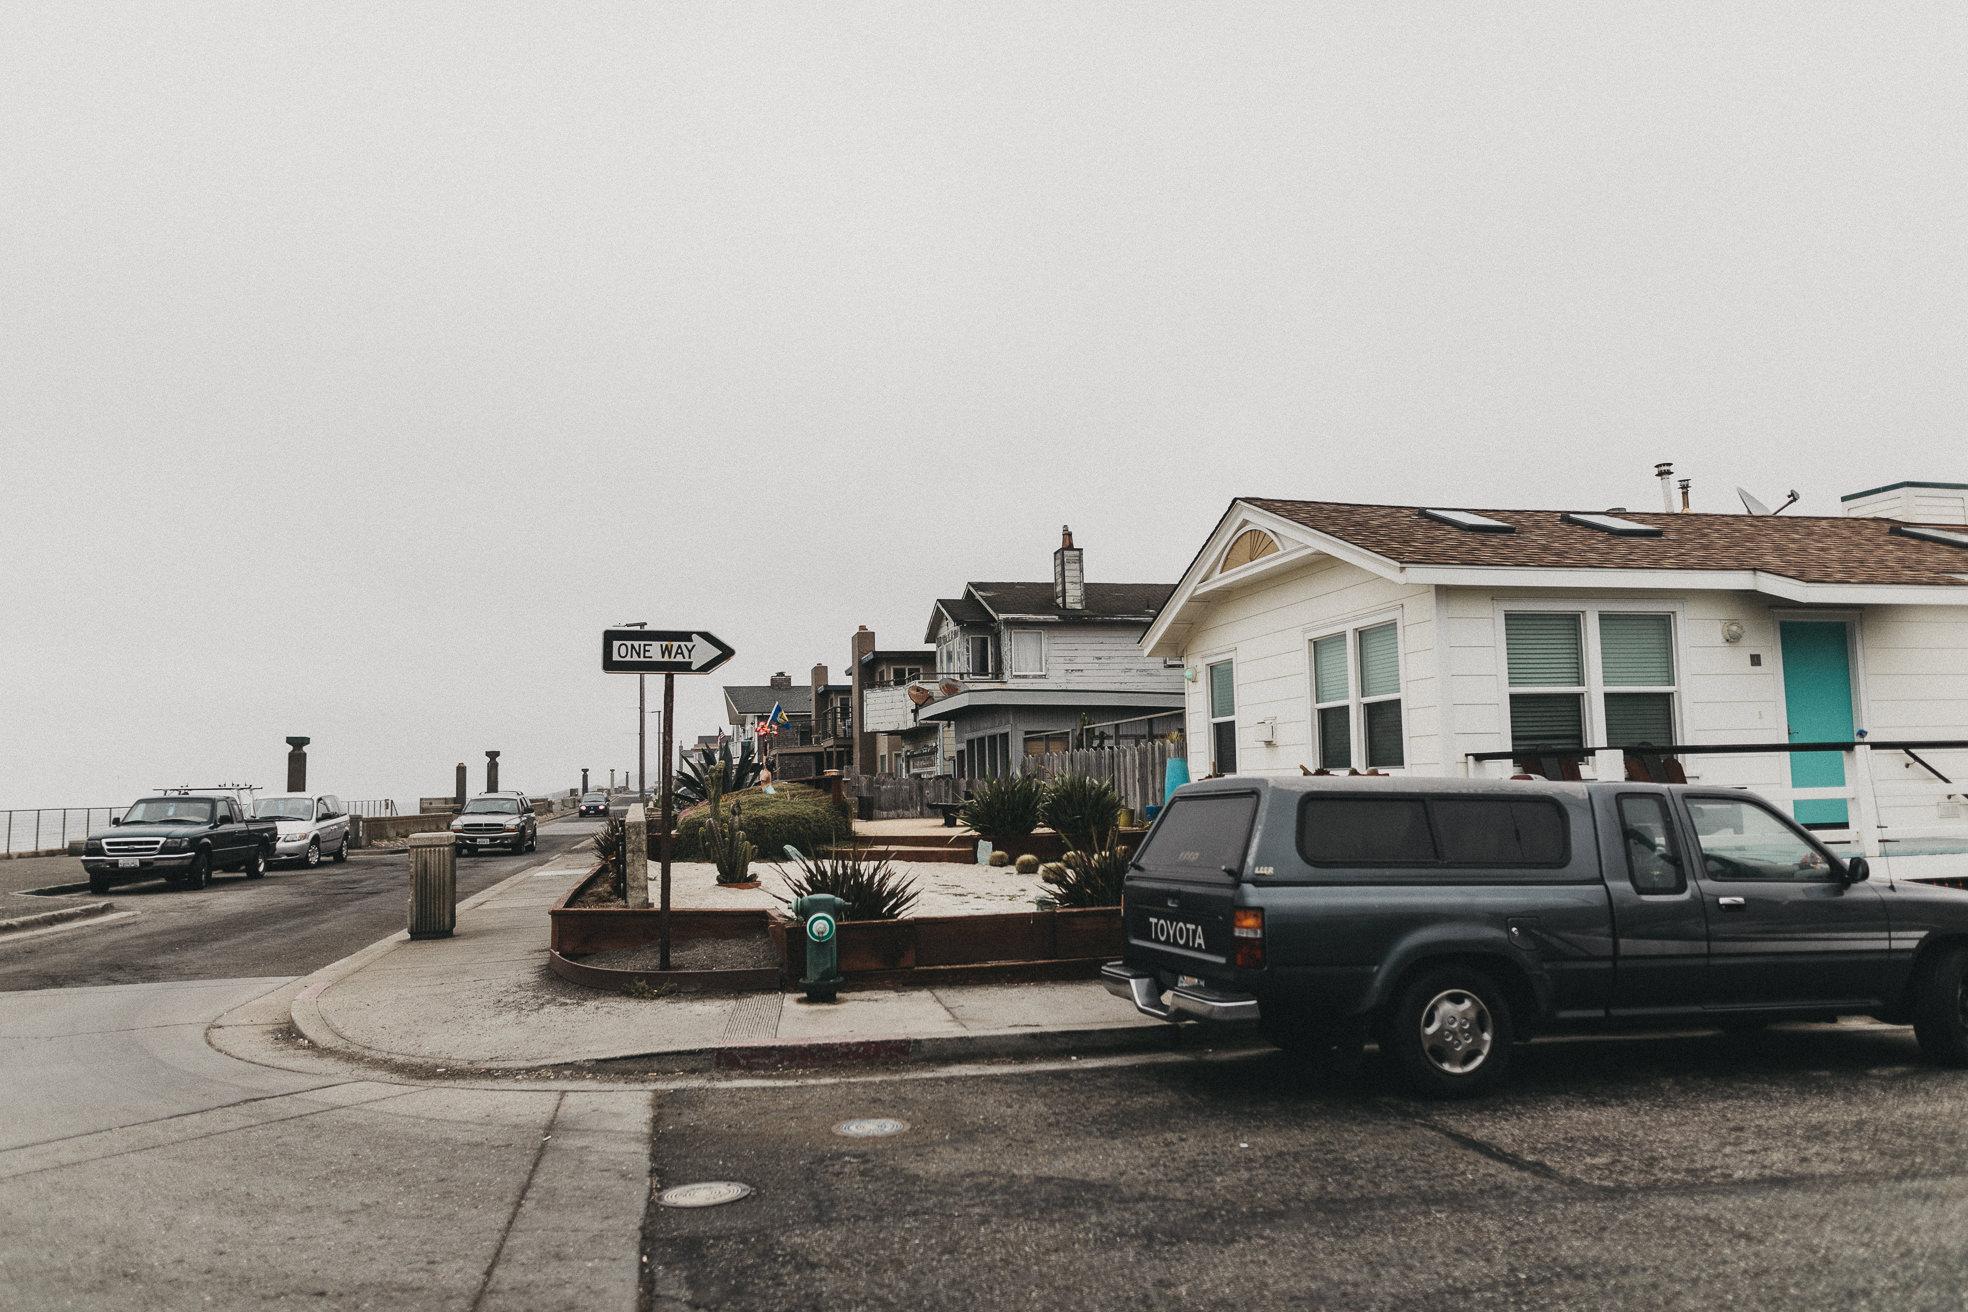 San-Francisco-BildervomLeben-9829